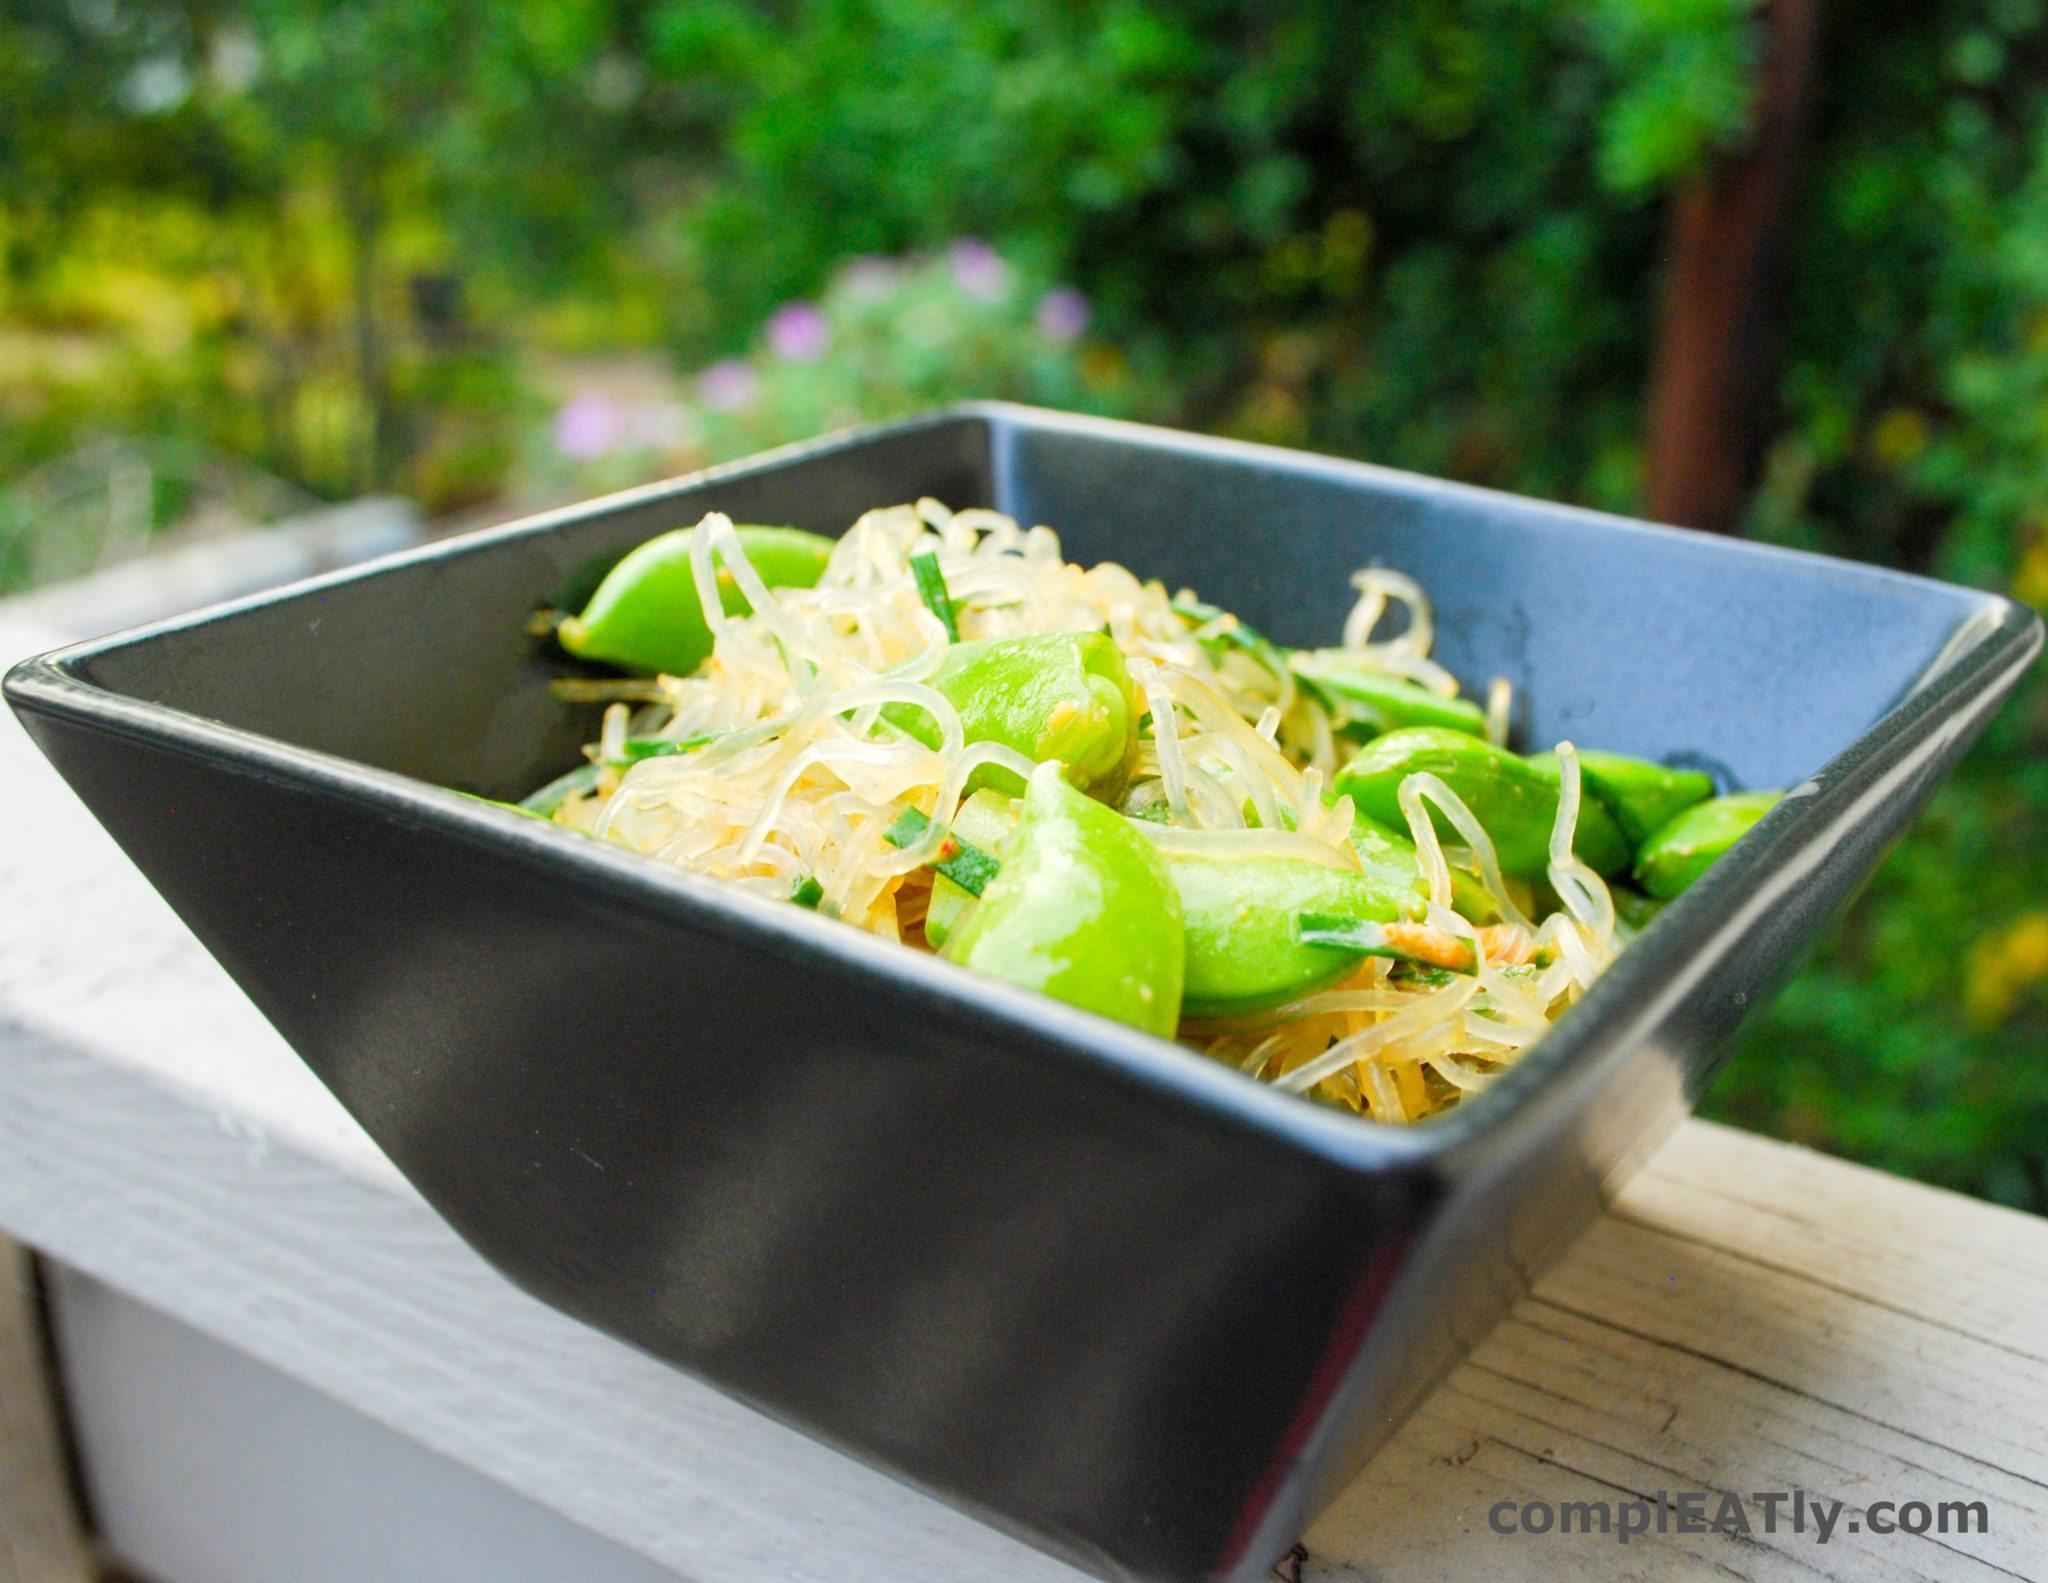 Kelp Noodle Salad with Peanut Sauce